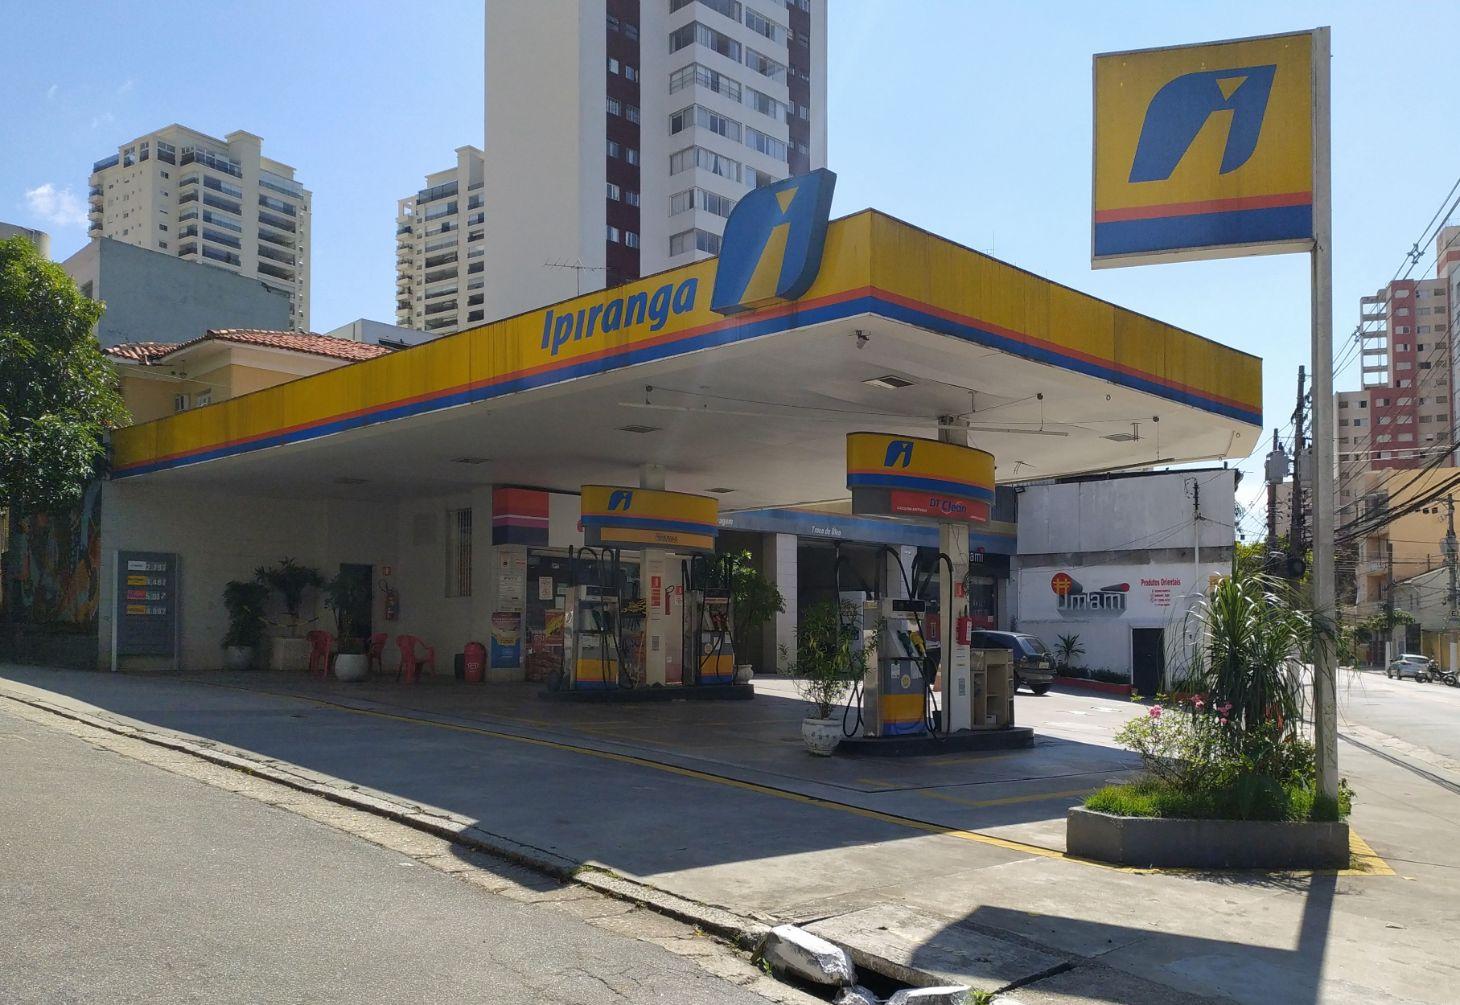 posto de combustivel ipiranga em sao paulo shutterstock